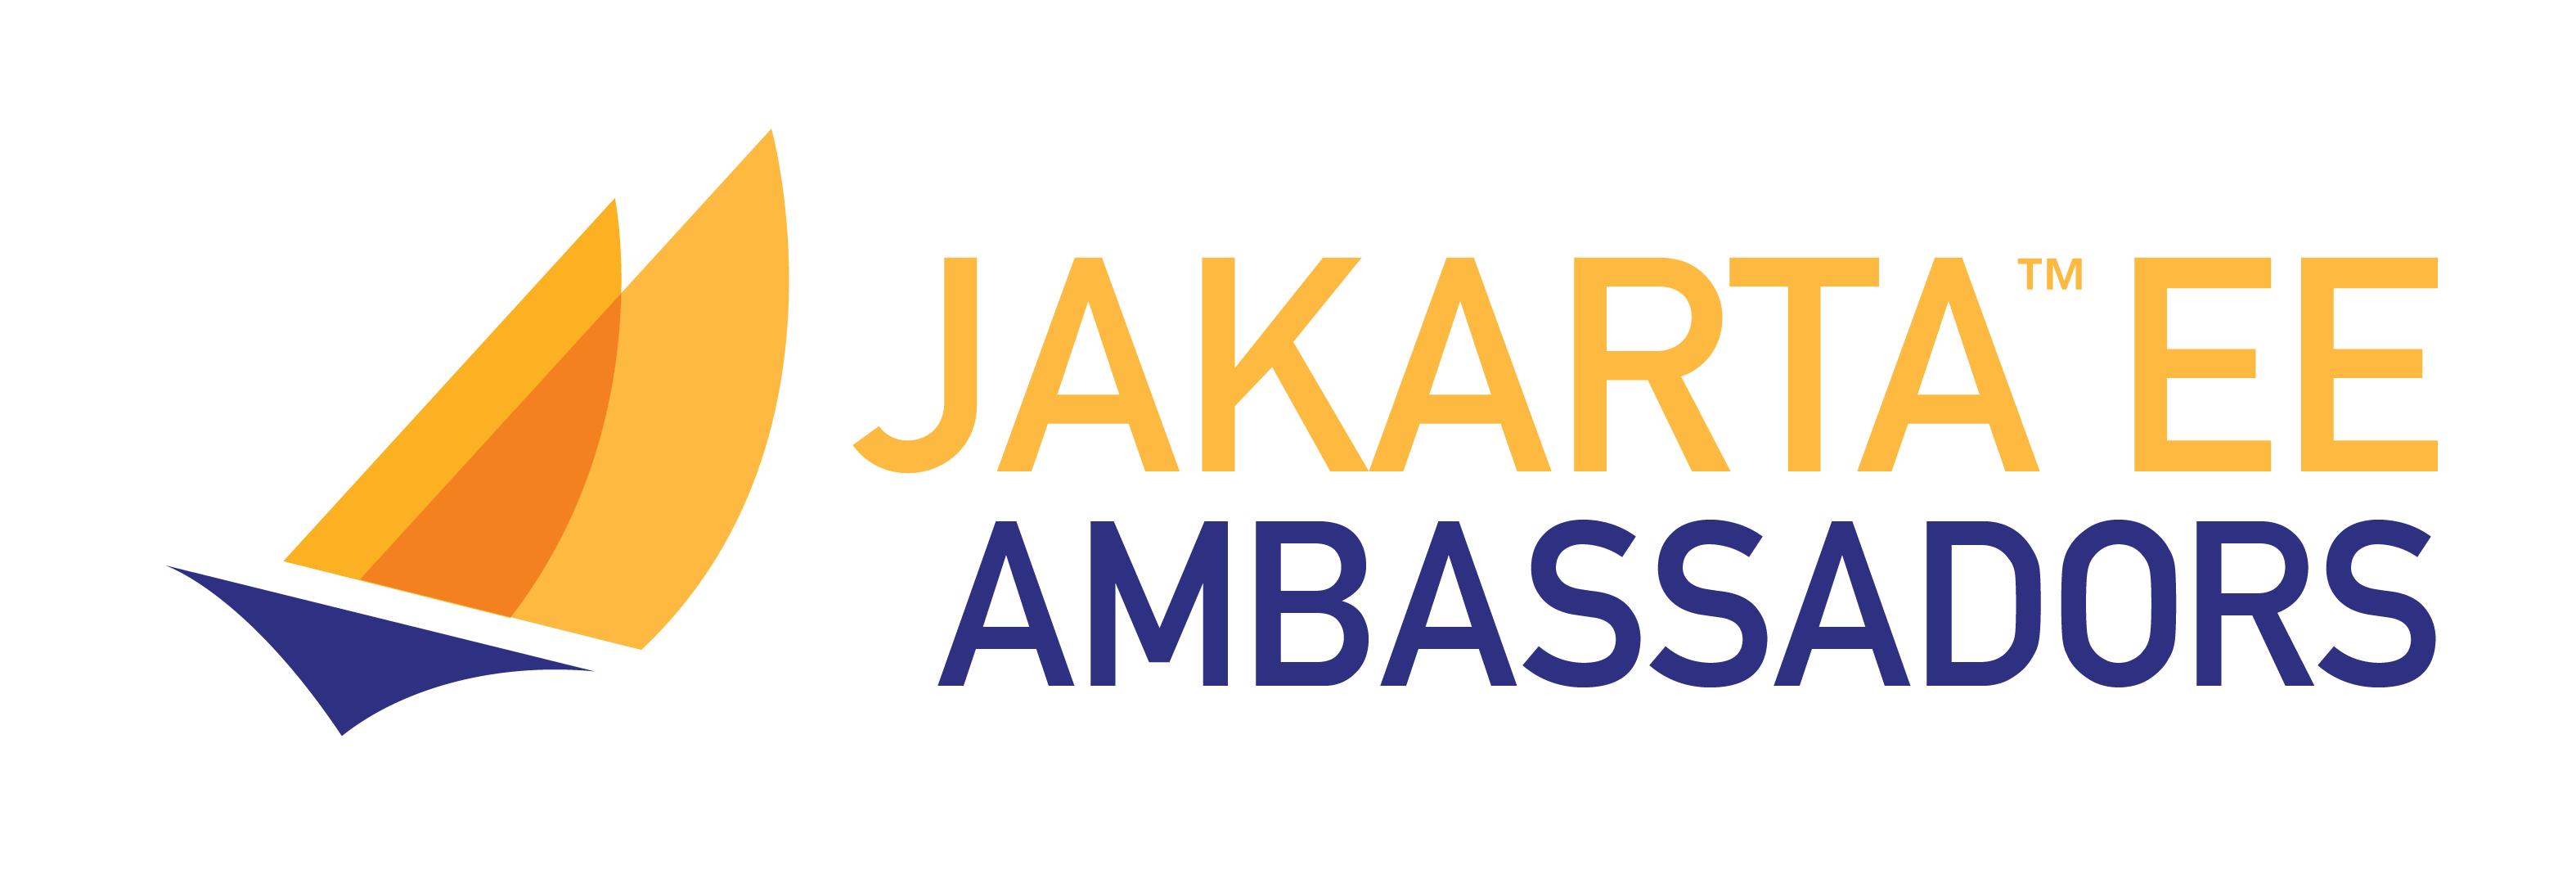 jakartaee_ambassadors